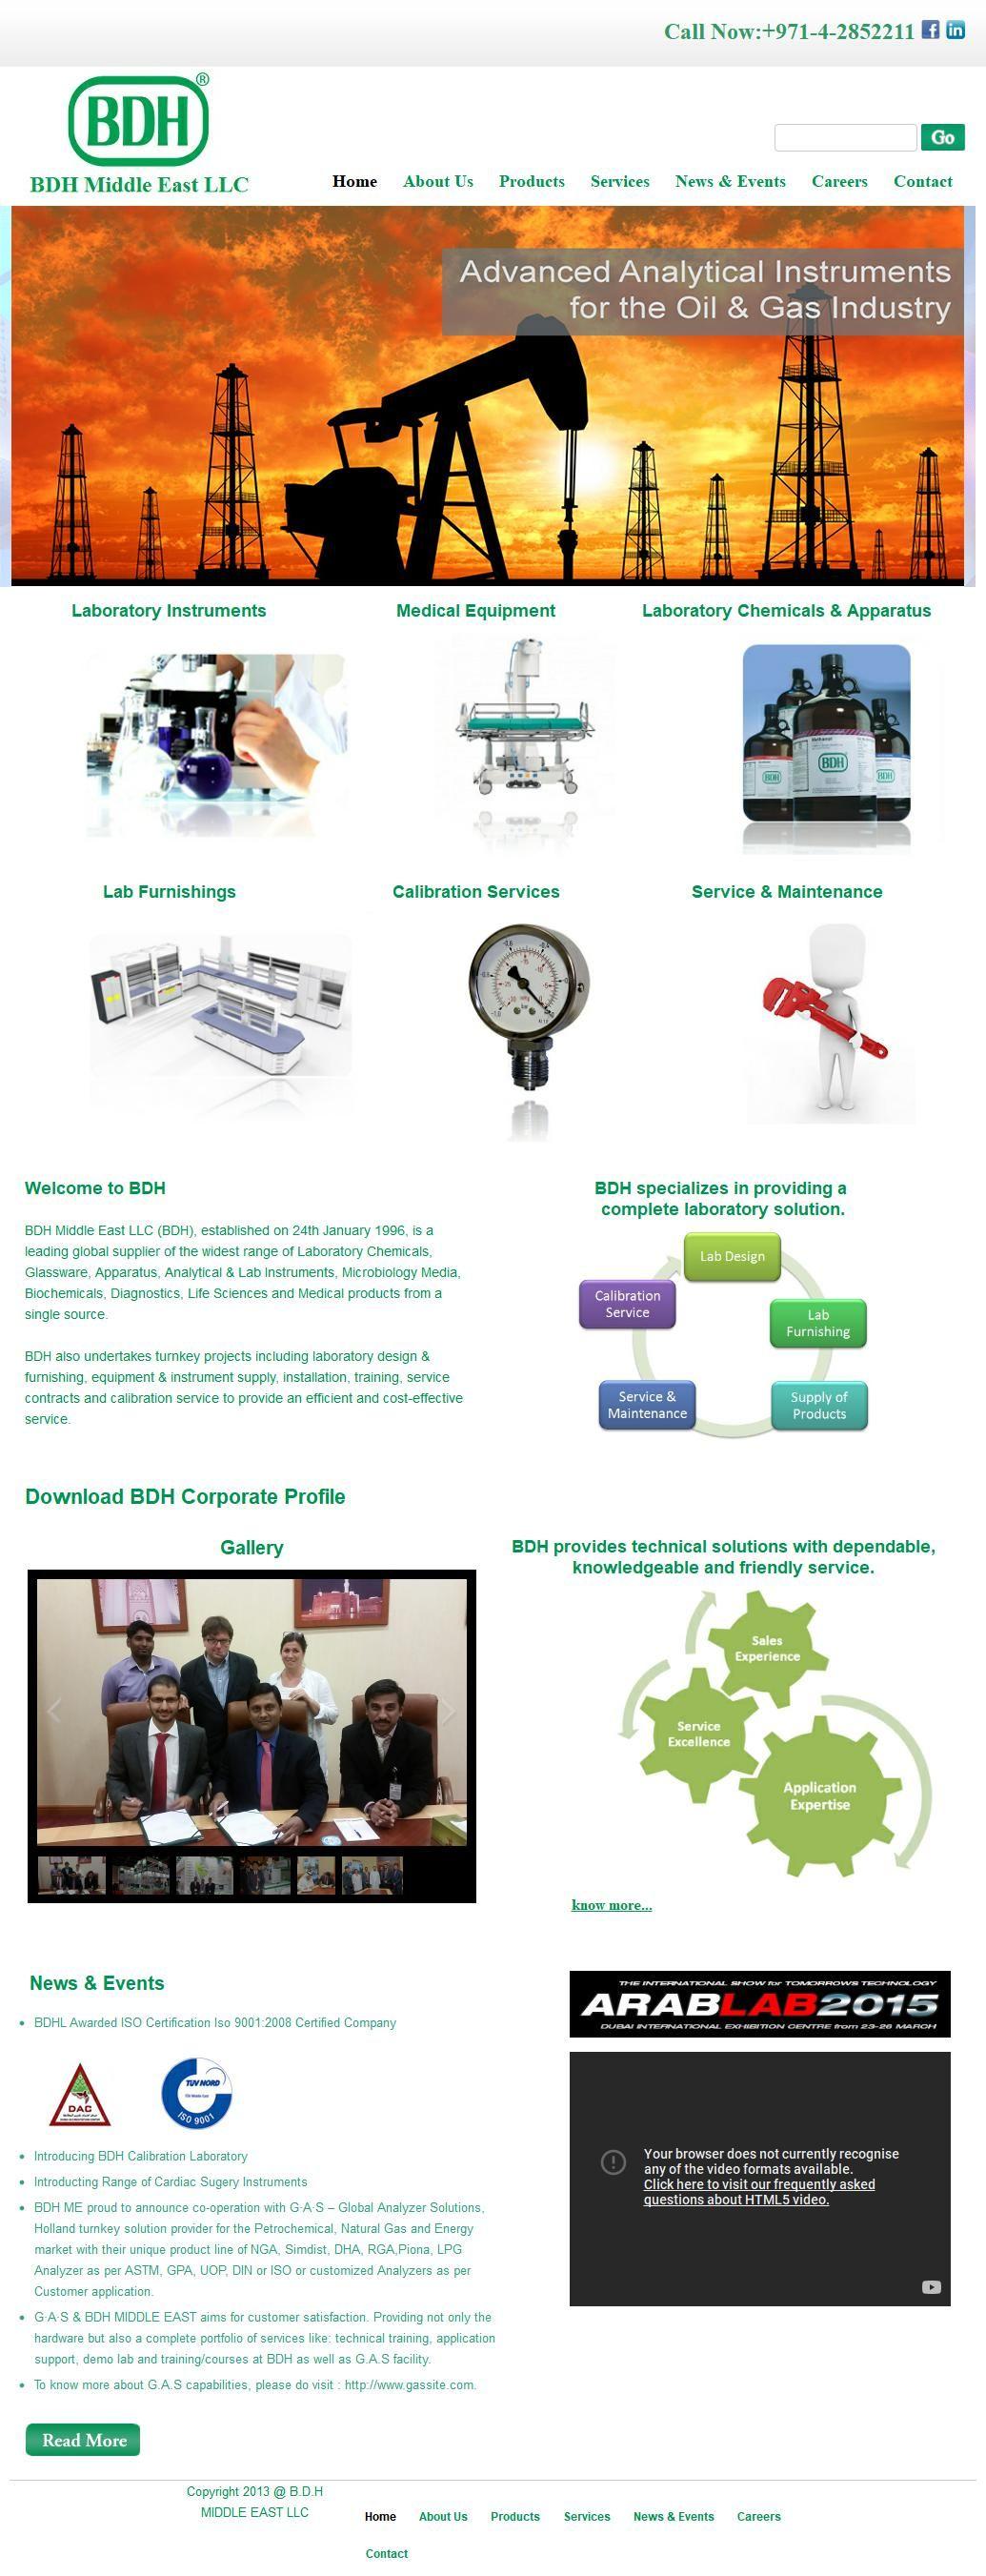 Bdh Laboratories Calibration Division Company Hafele Group, 34, 13